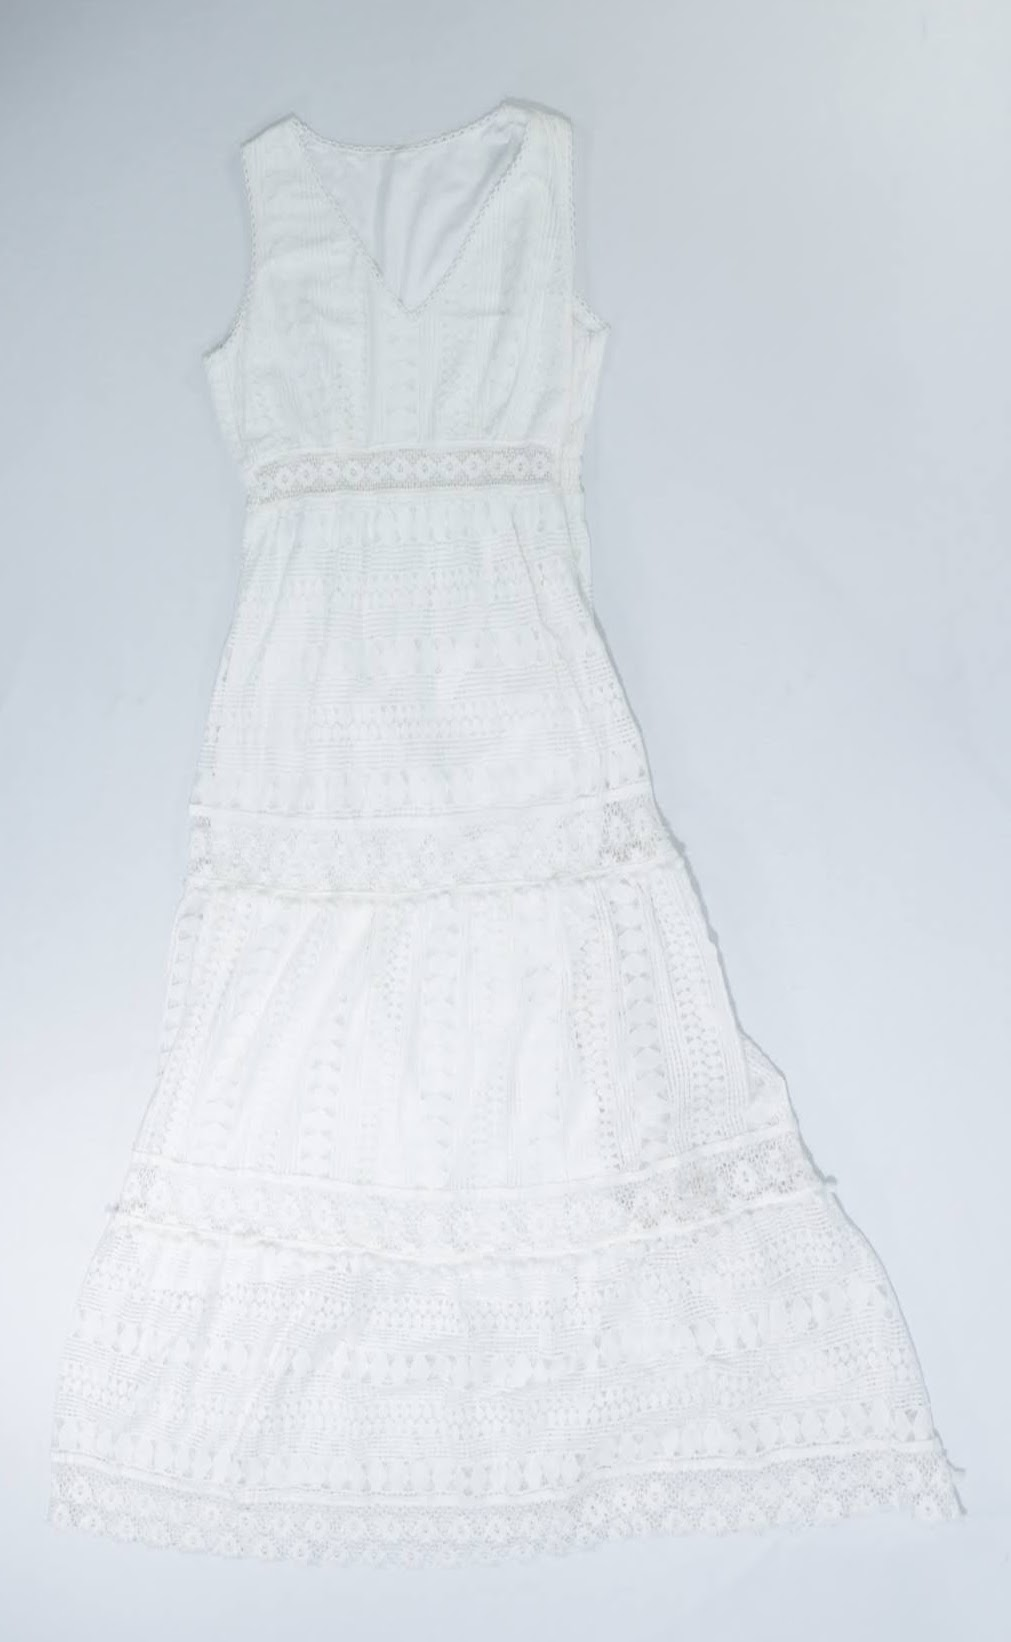 Vestido (Sem marca) - Tam 40